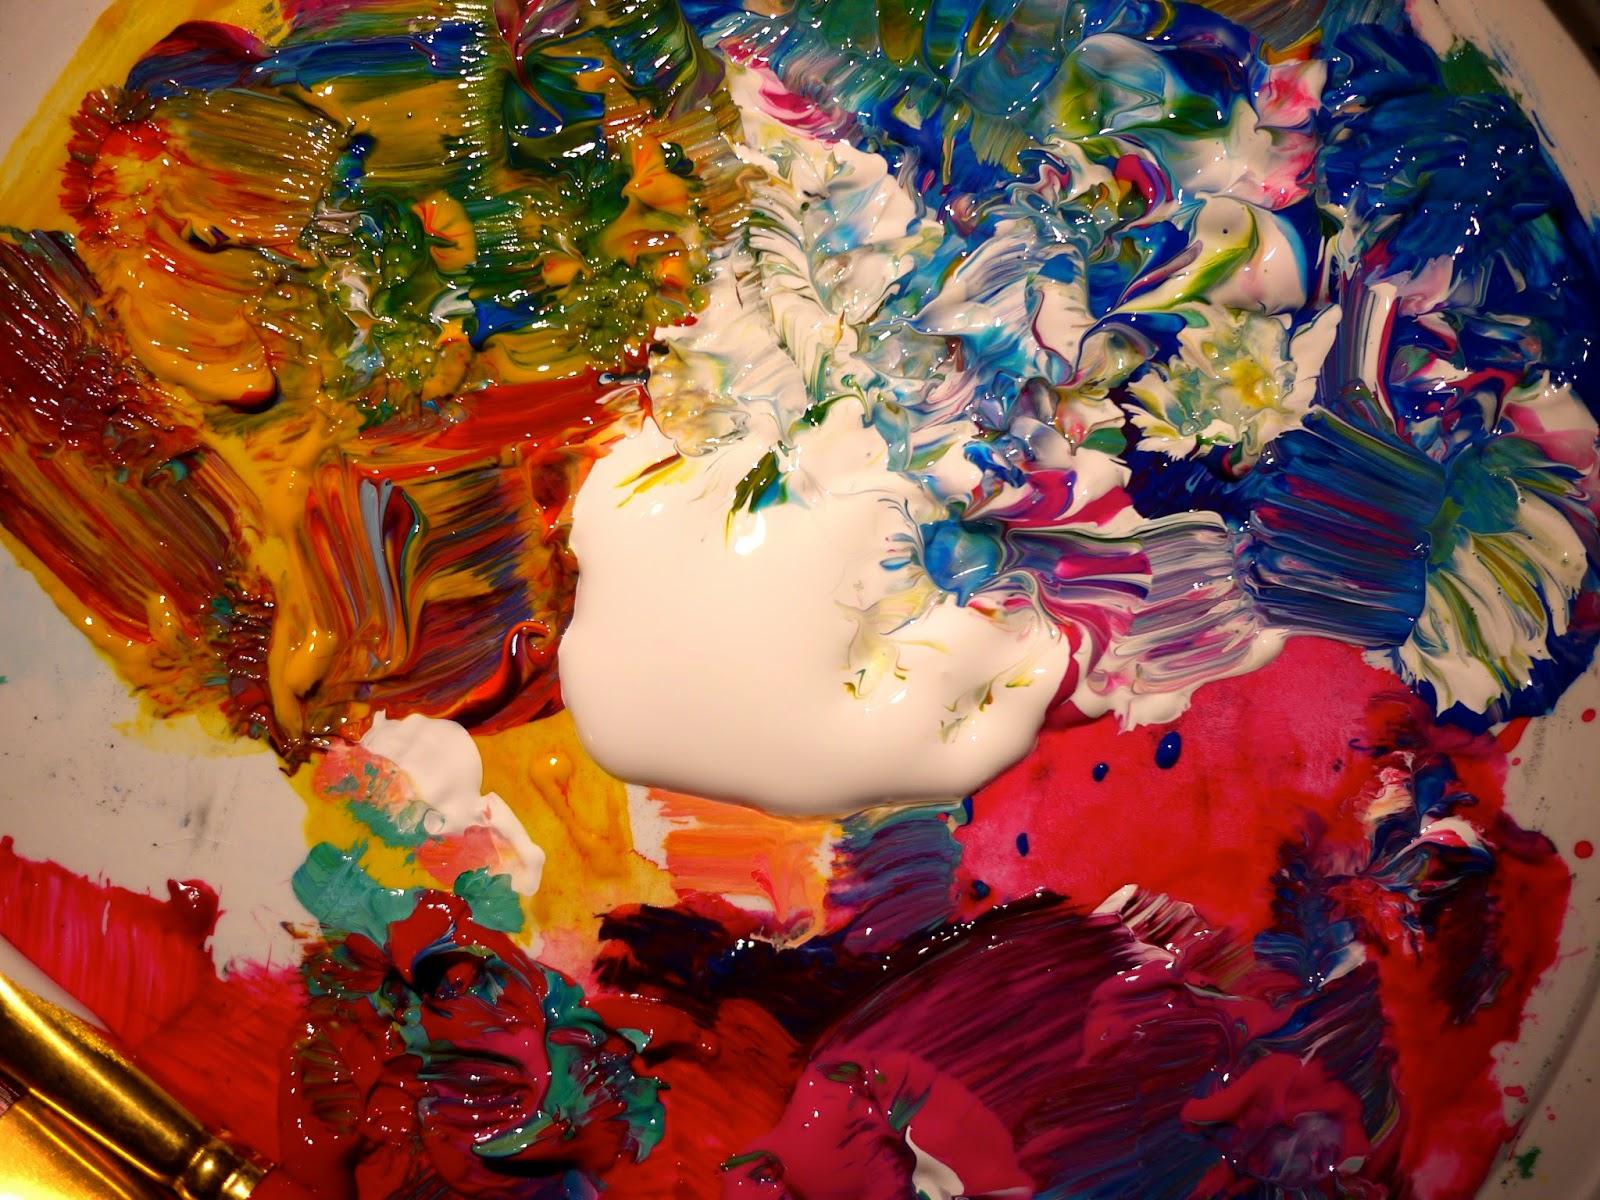 smooshing paint how - photo #31